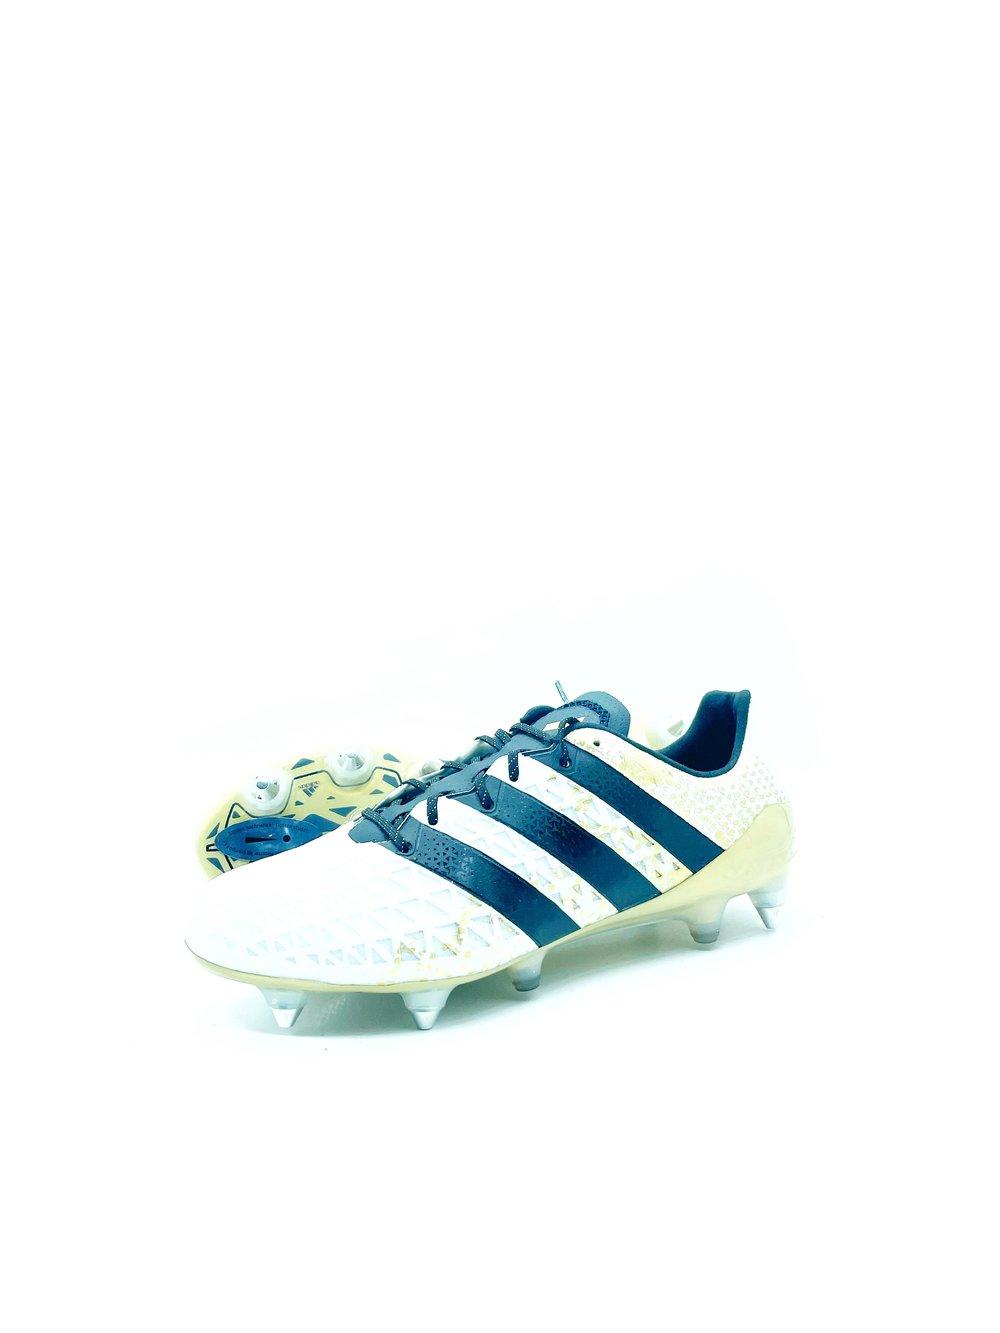 Image of Adidas 16.1 ACE gold FG WHITE SG OR FG